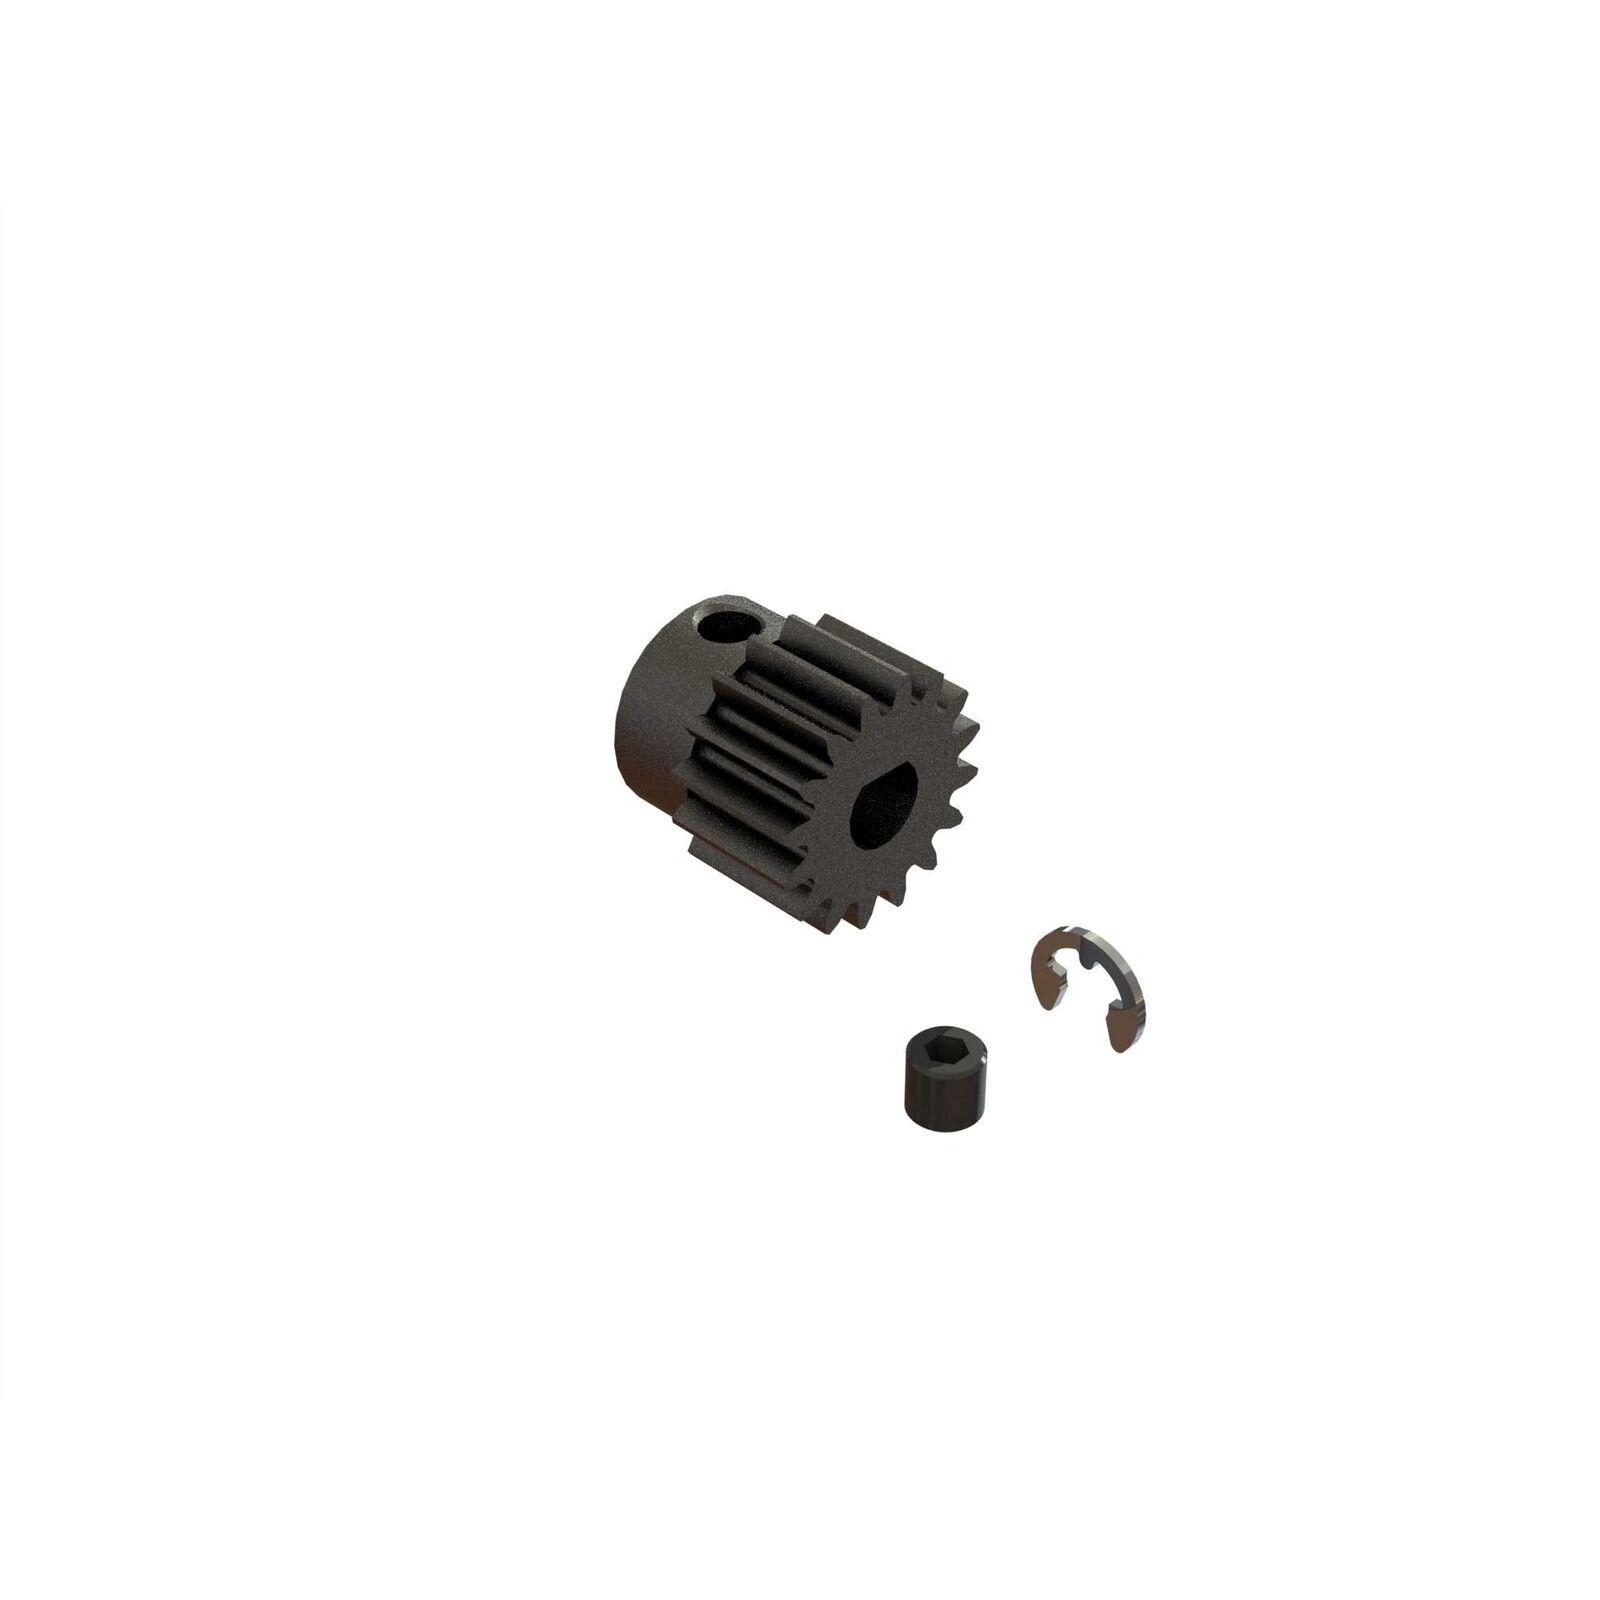 17T 0.8Mod Safe-D5 Pinion Gear